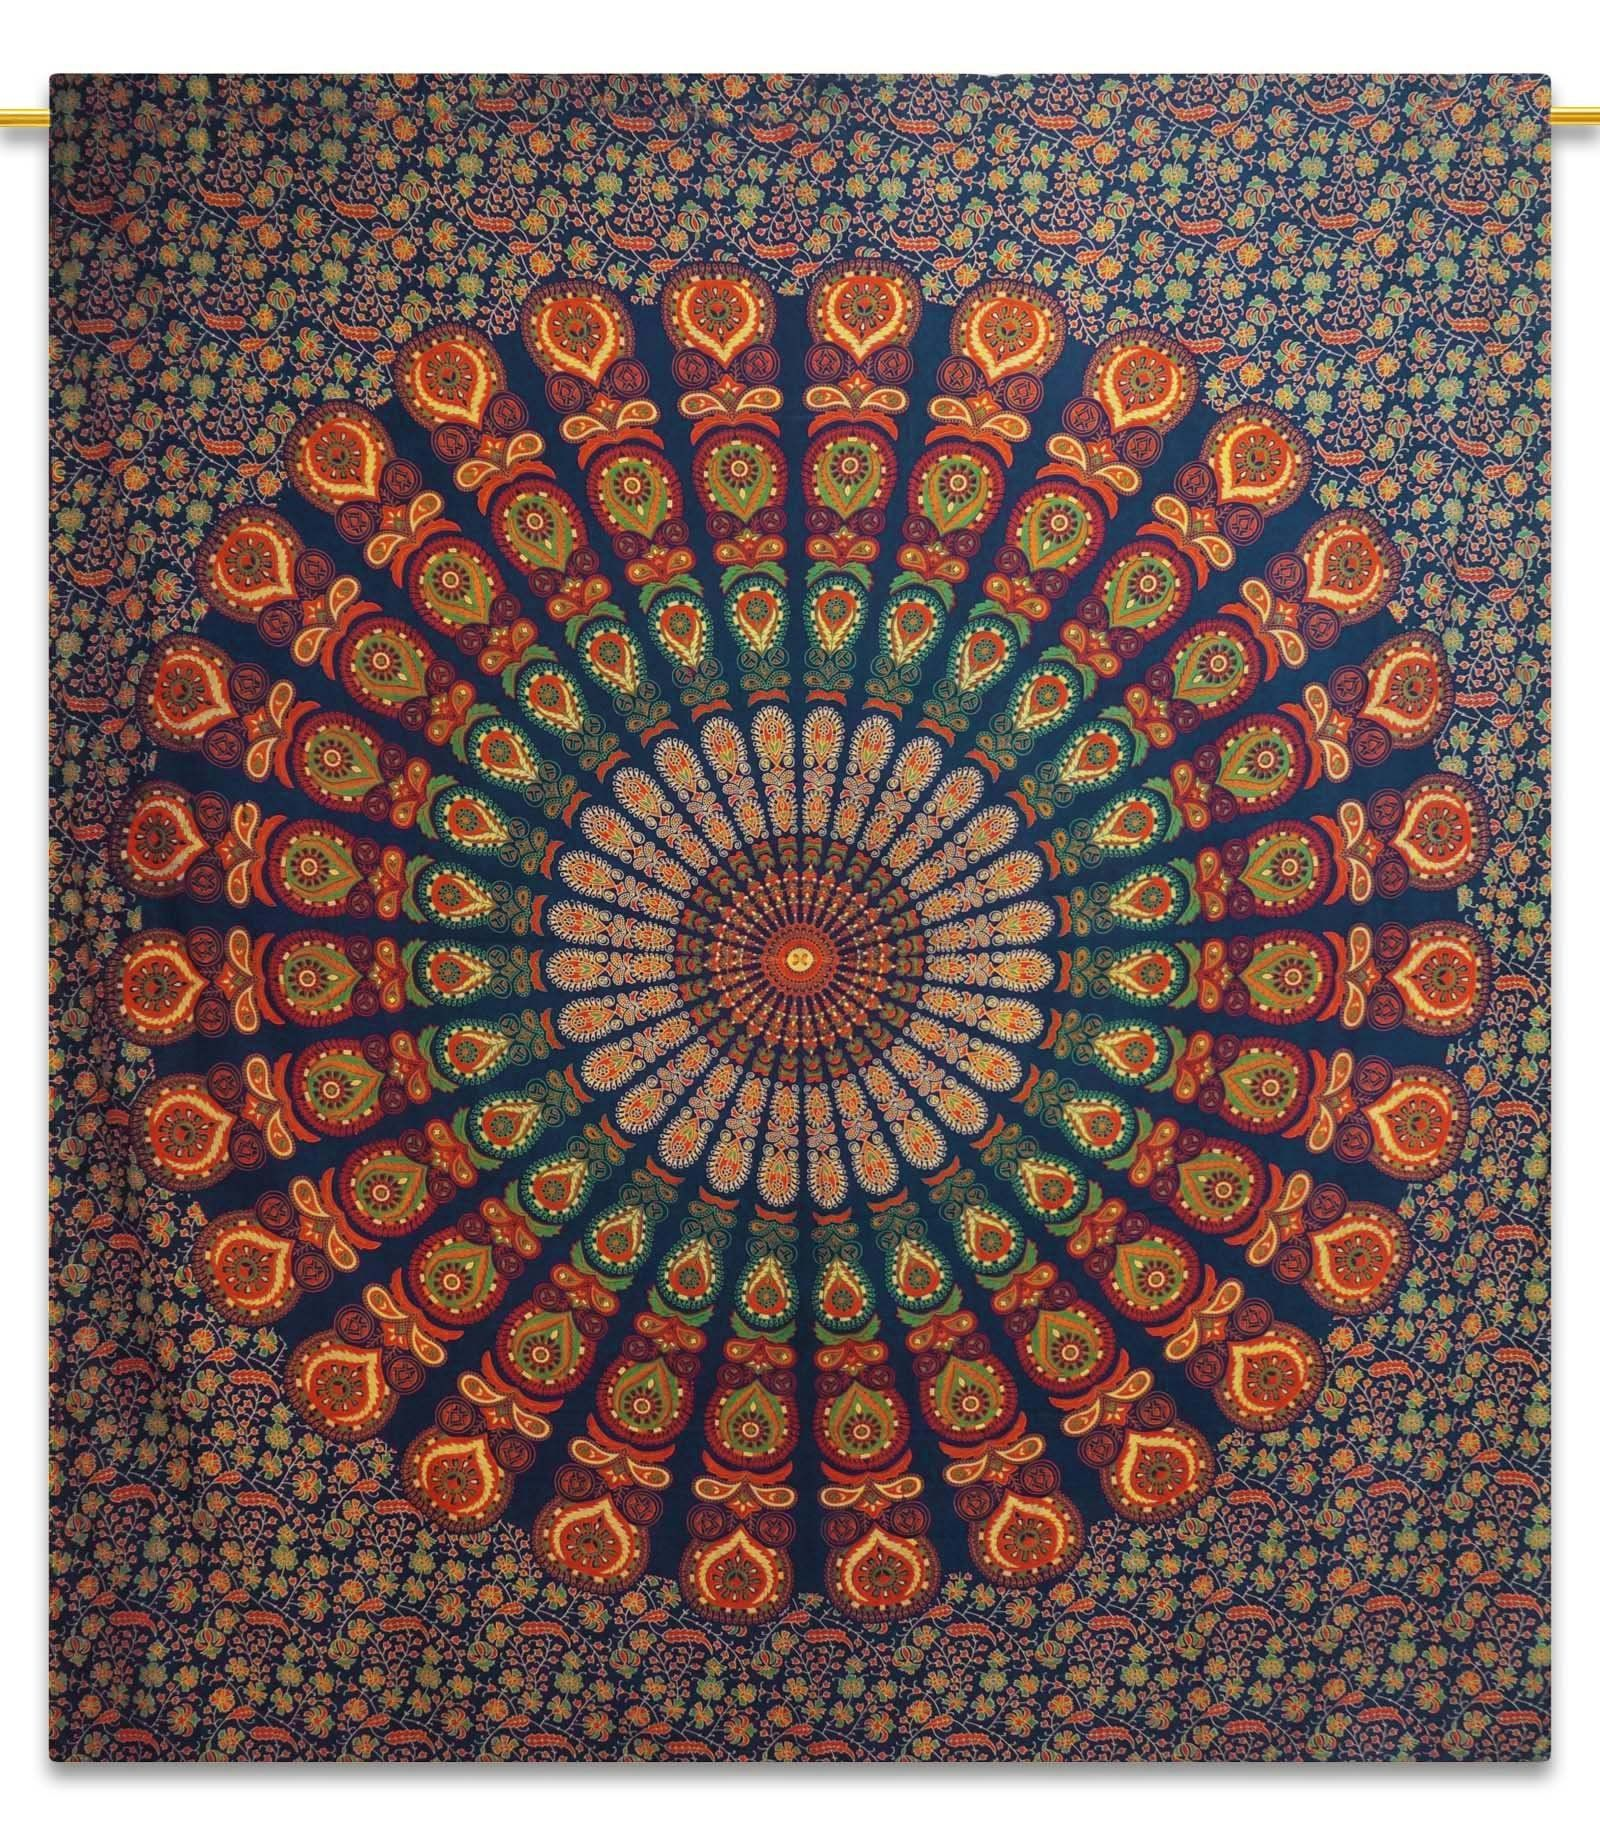 Amazon Queen Bleu handicrunch mandala coton bleu tapisserie pleine grandeur